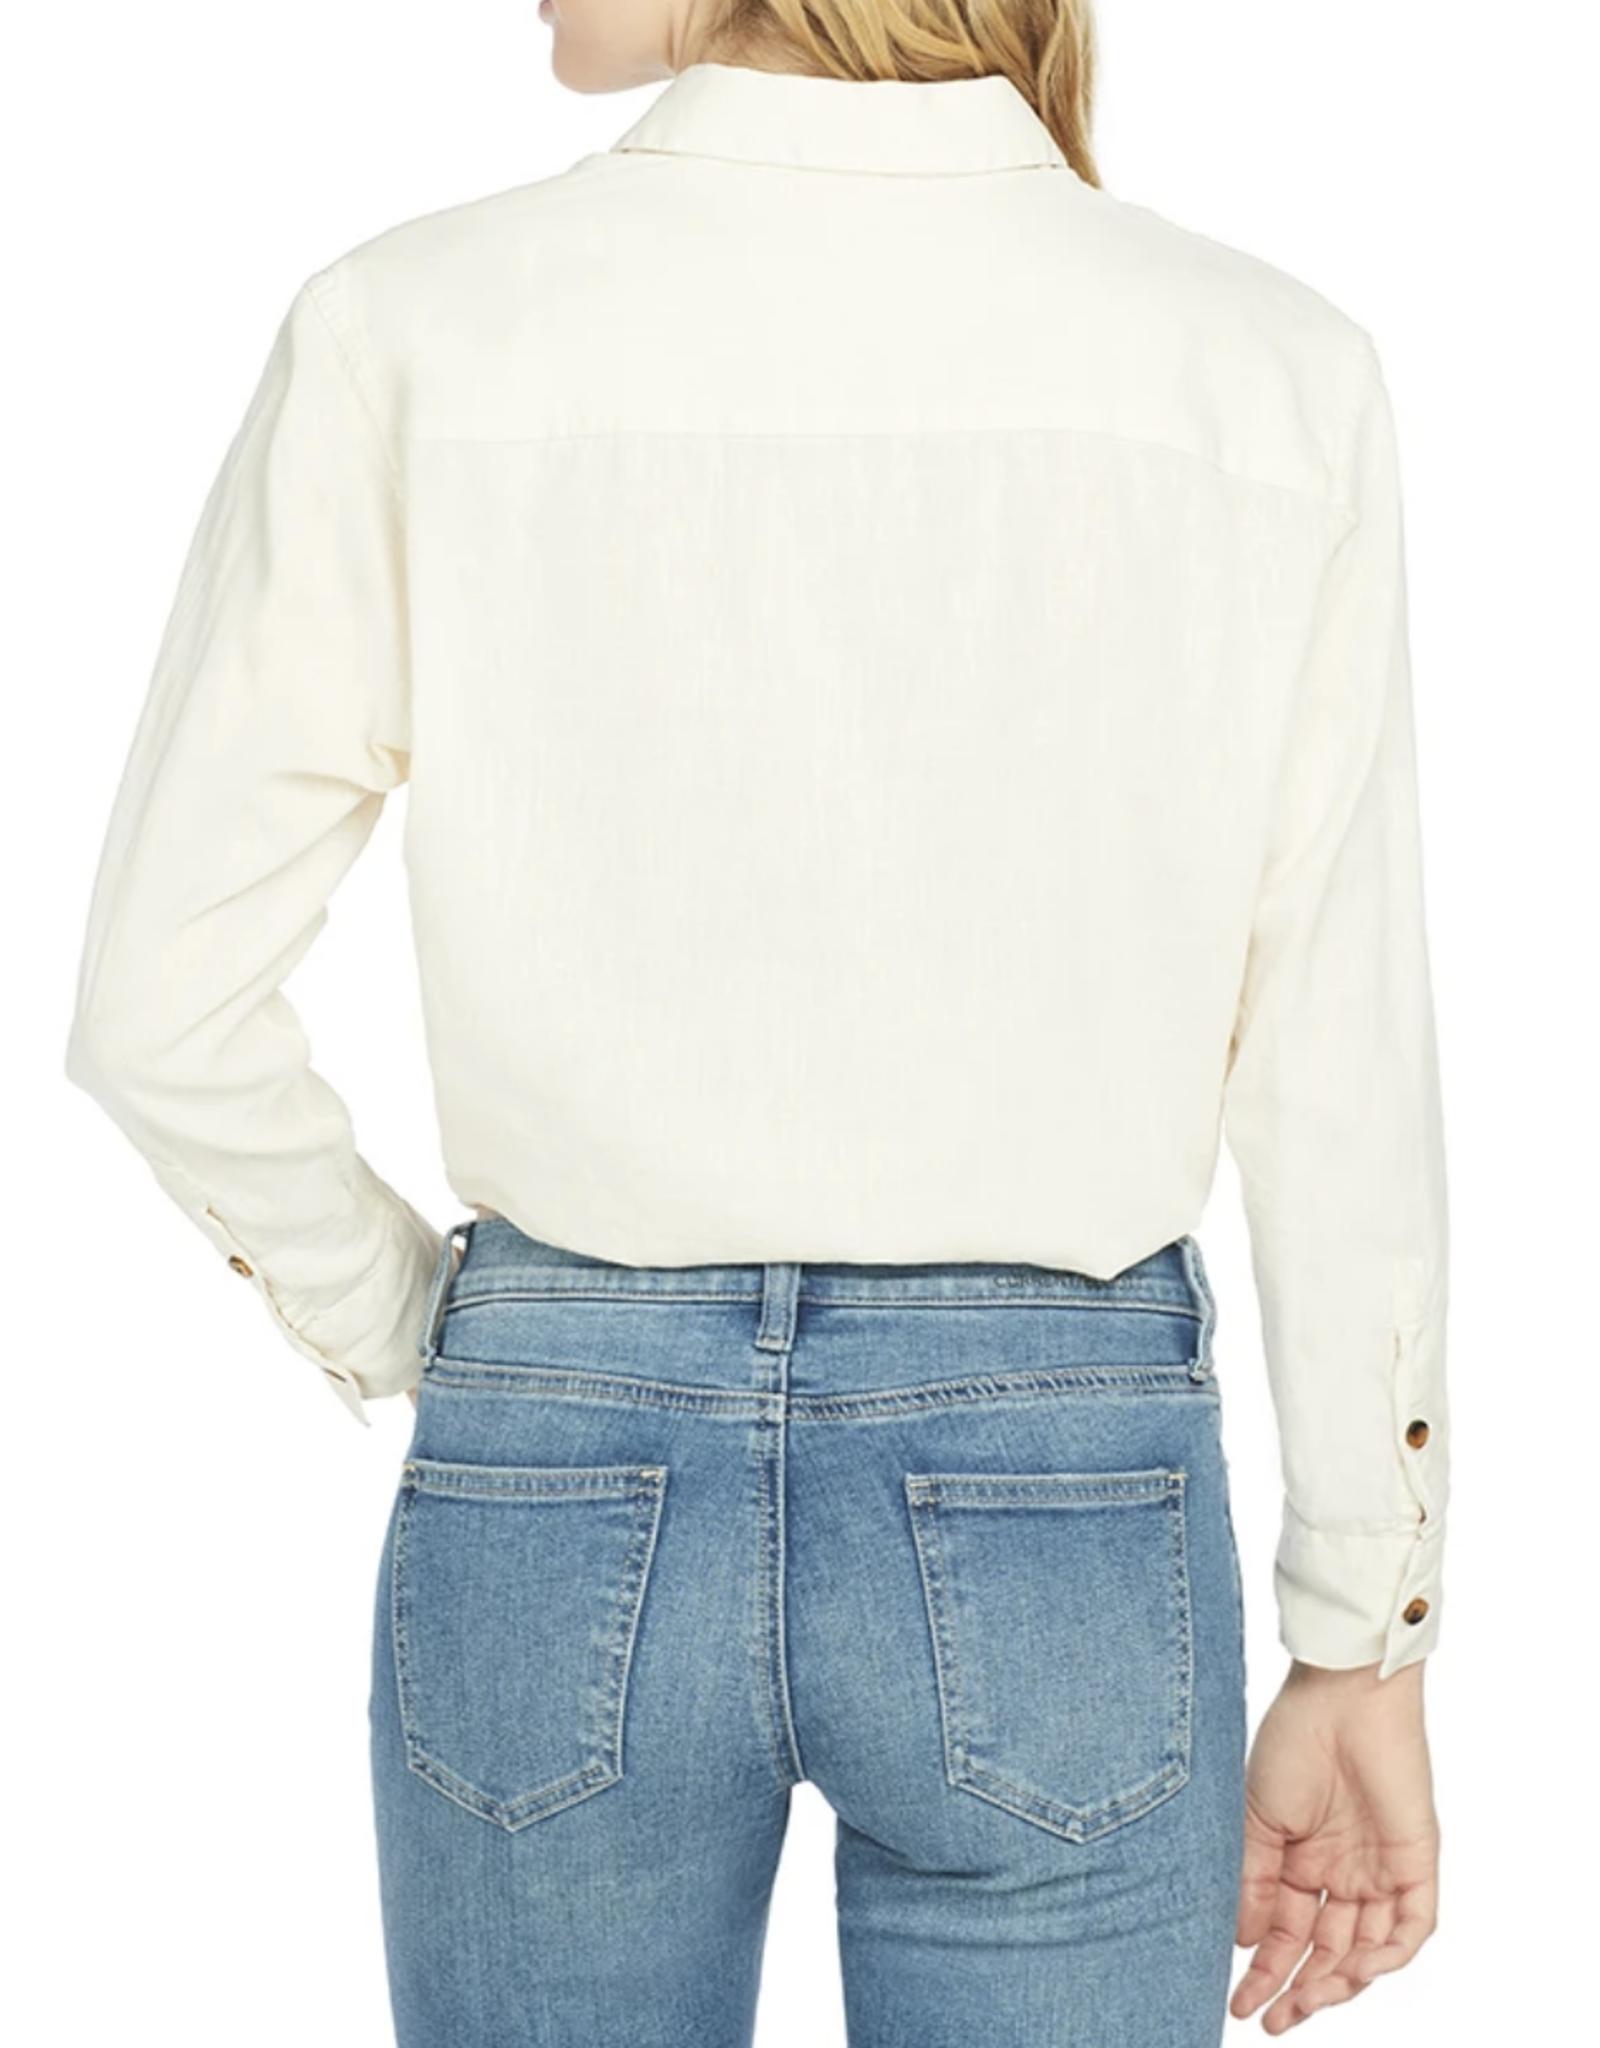 Solid & Striped Cream Linen Button Down Shirt